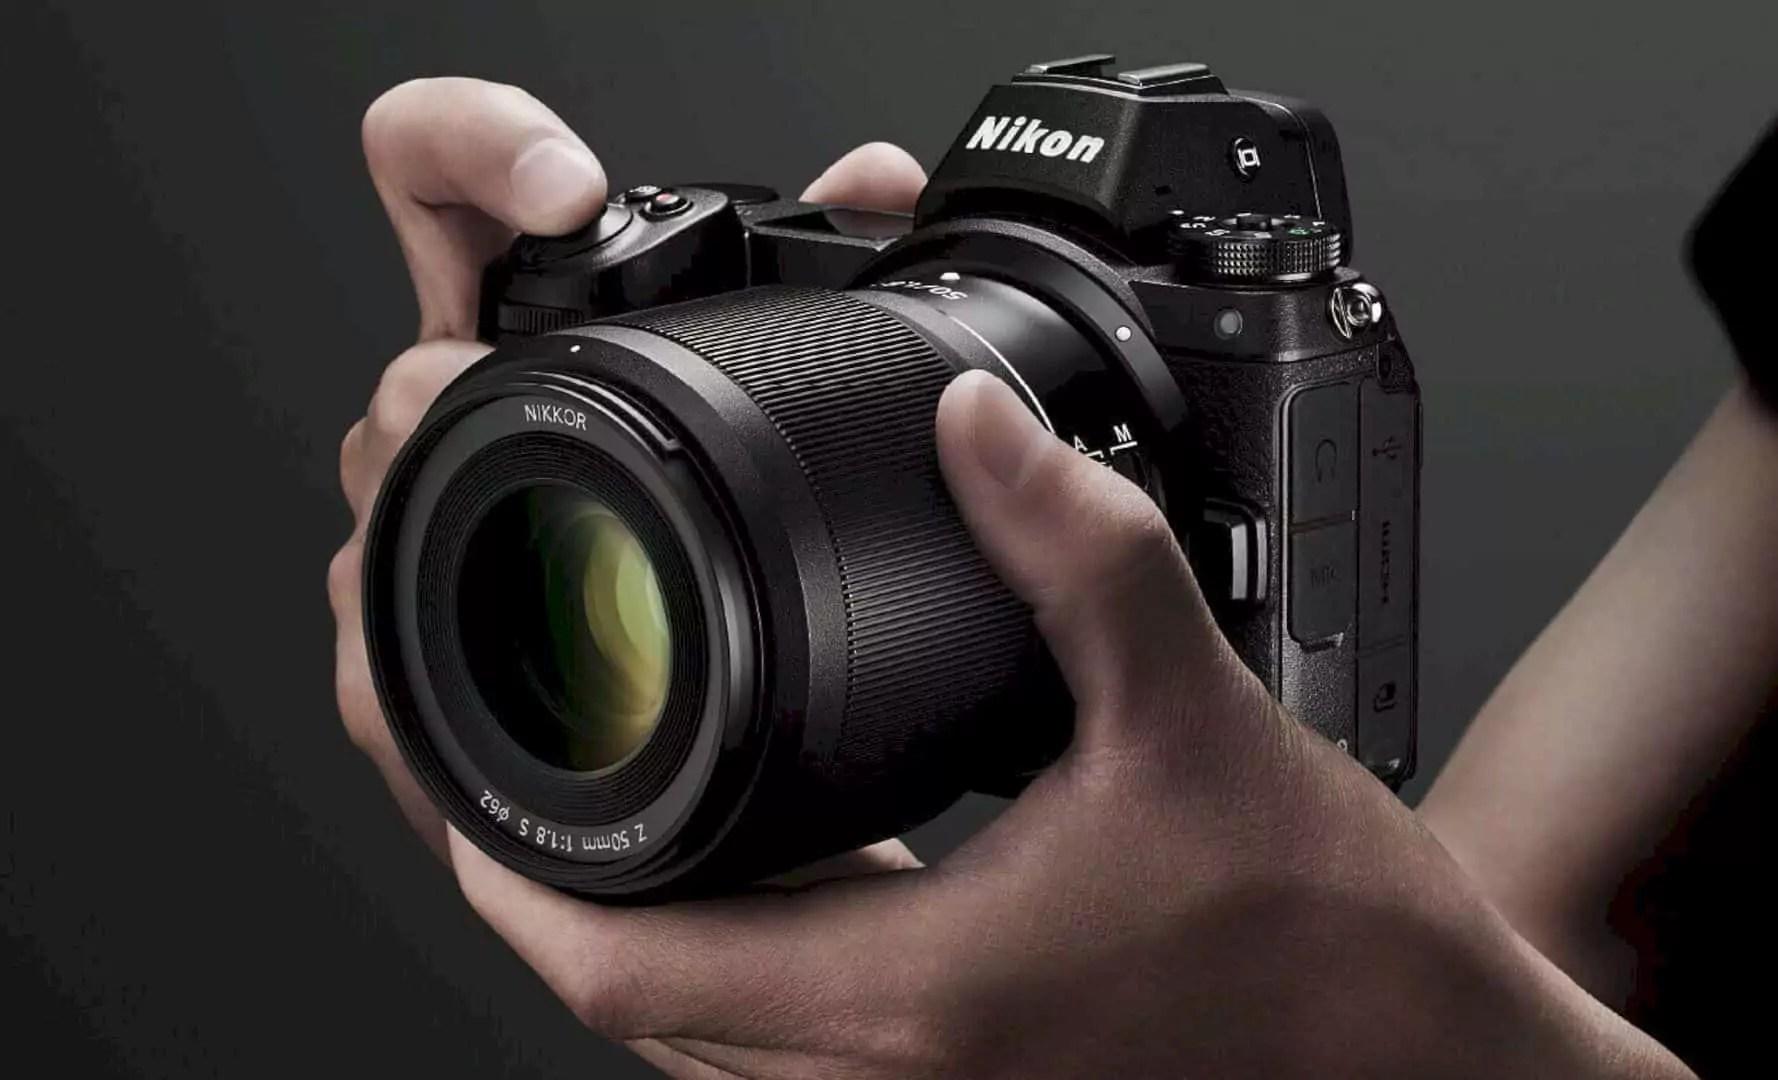 Nikon Z7: The New Flagship Mirrorless Full-Frame Camera